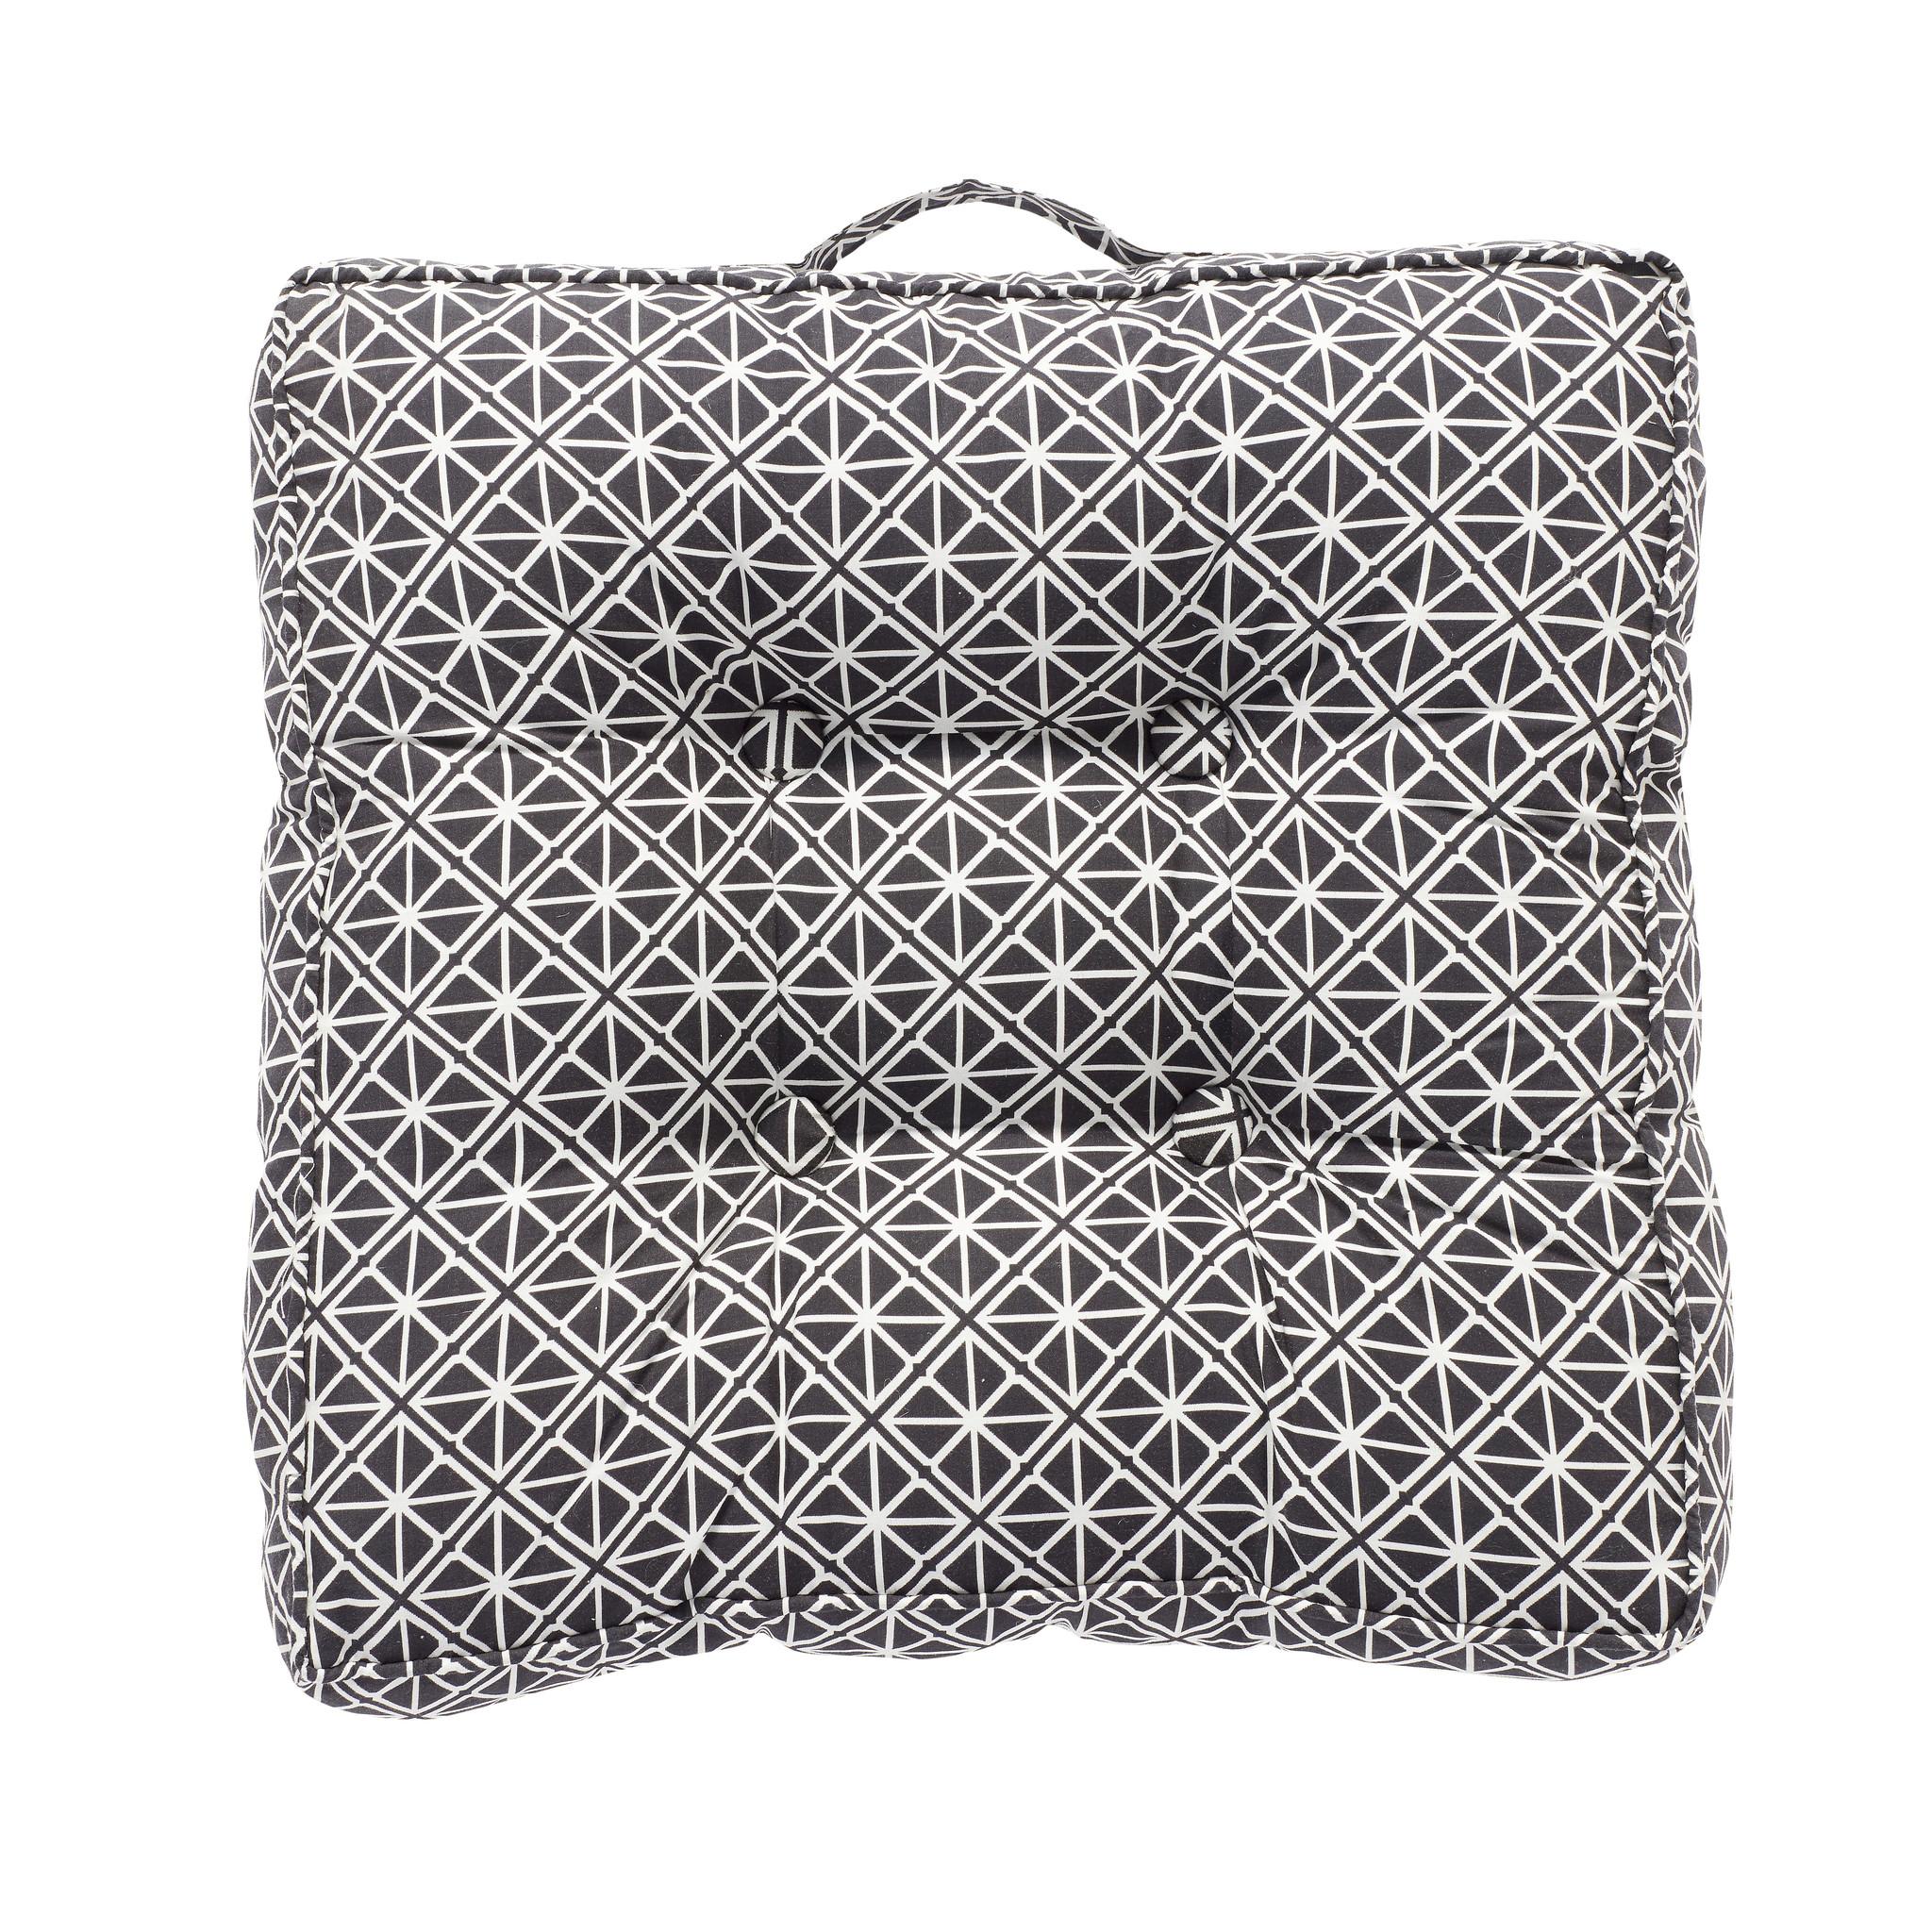 Hubsch Kussen met handvat / patroon, zwart / wit